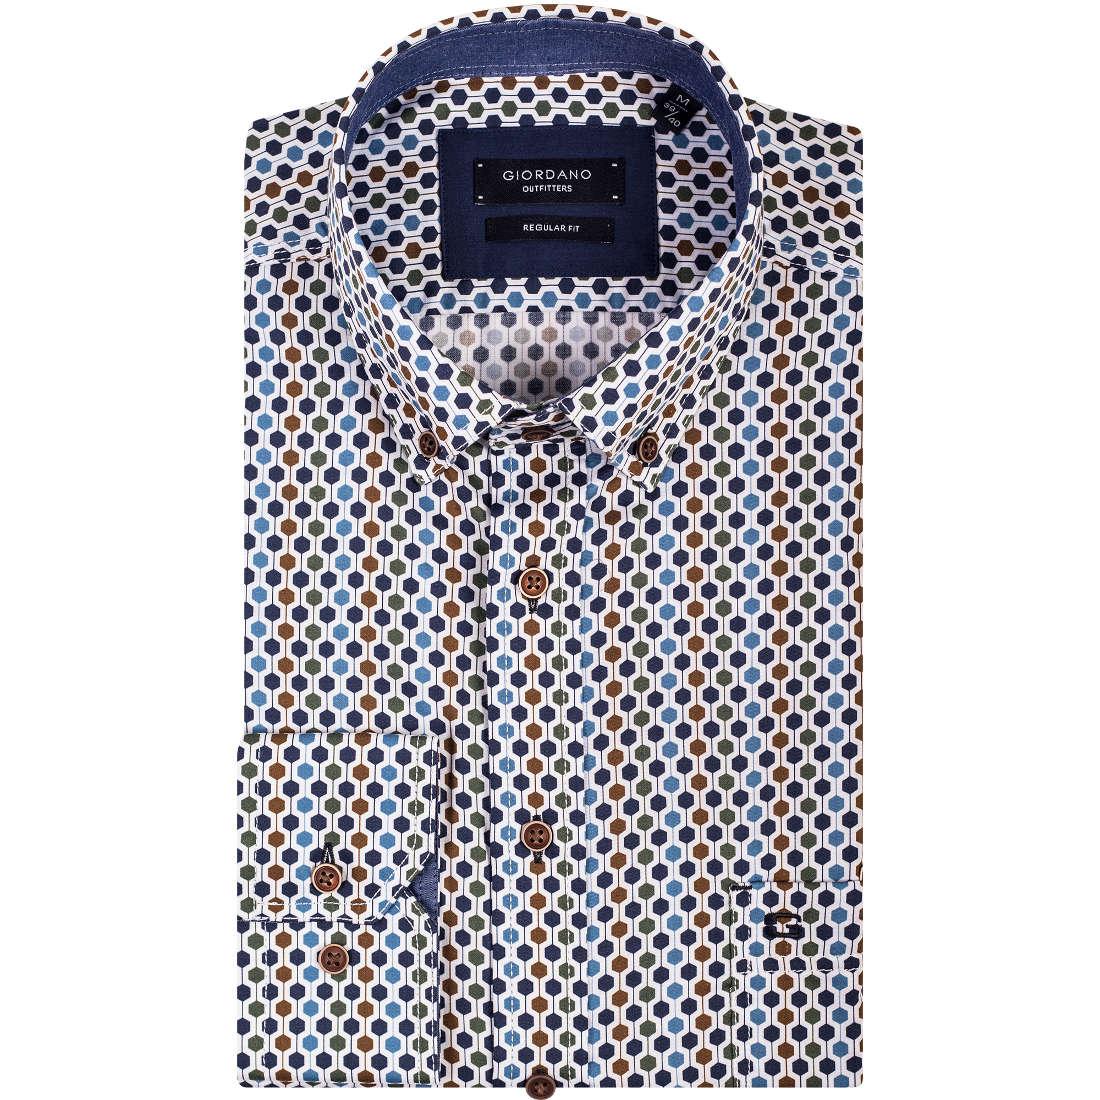 Giordano overhemd Regular Fit 827028 in het Groen